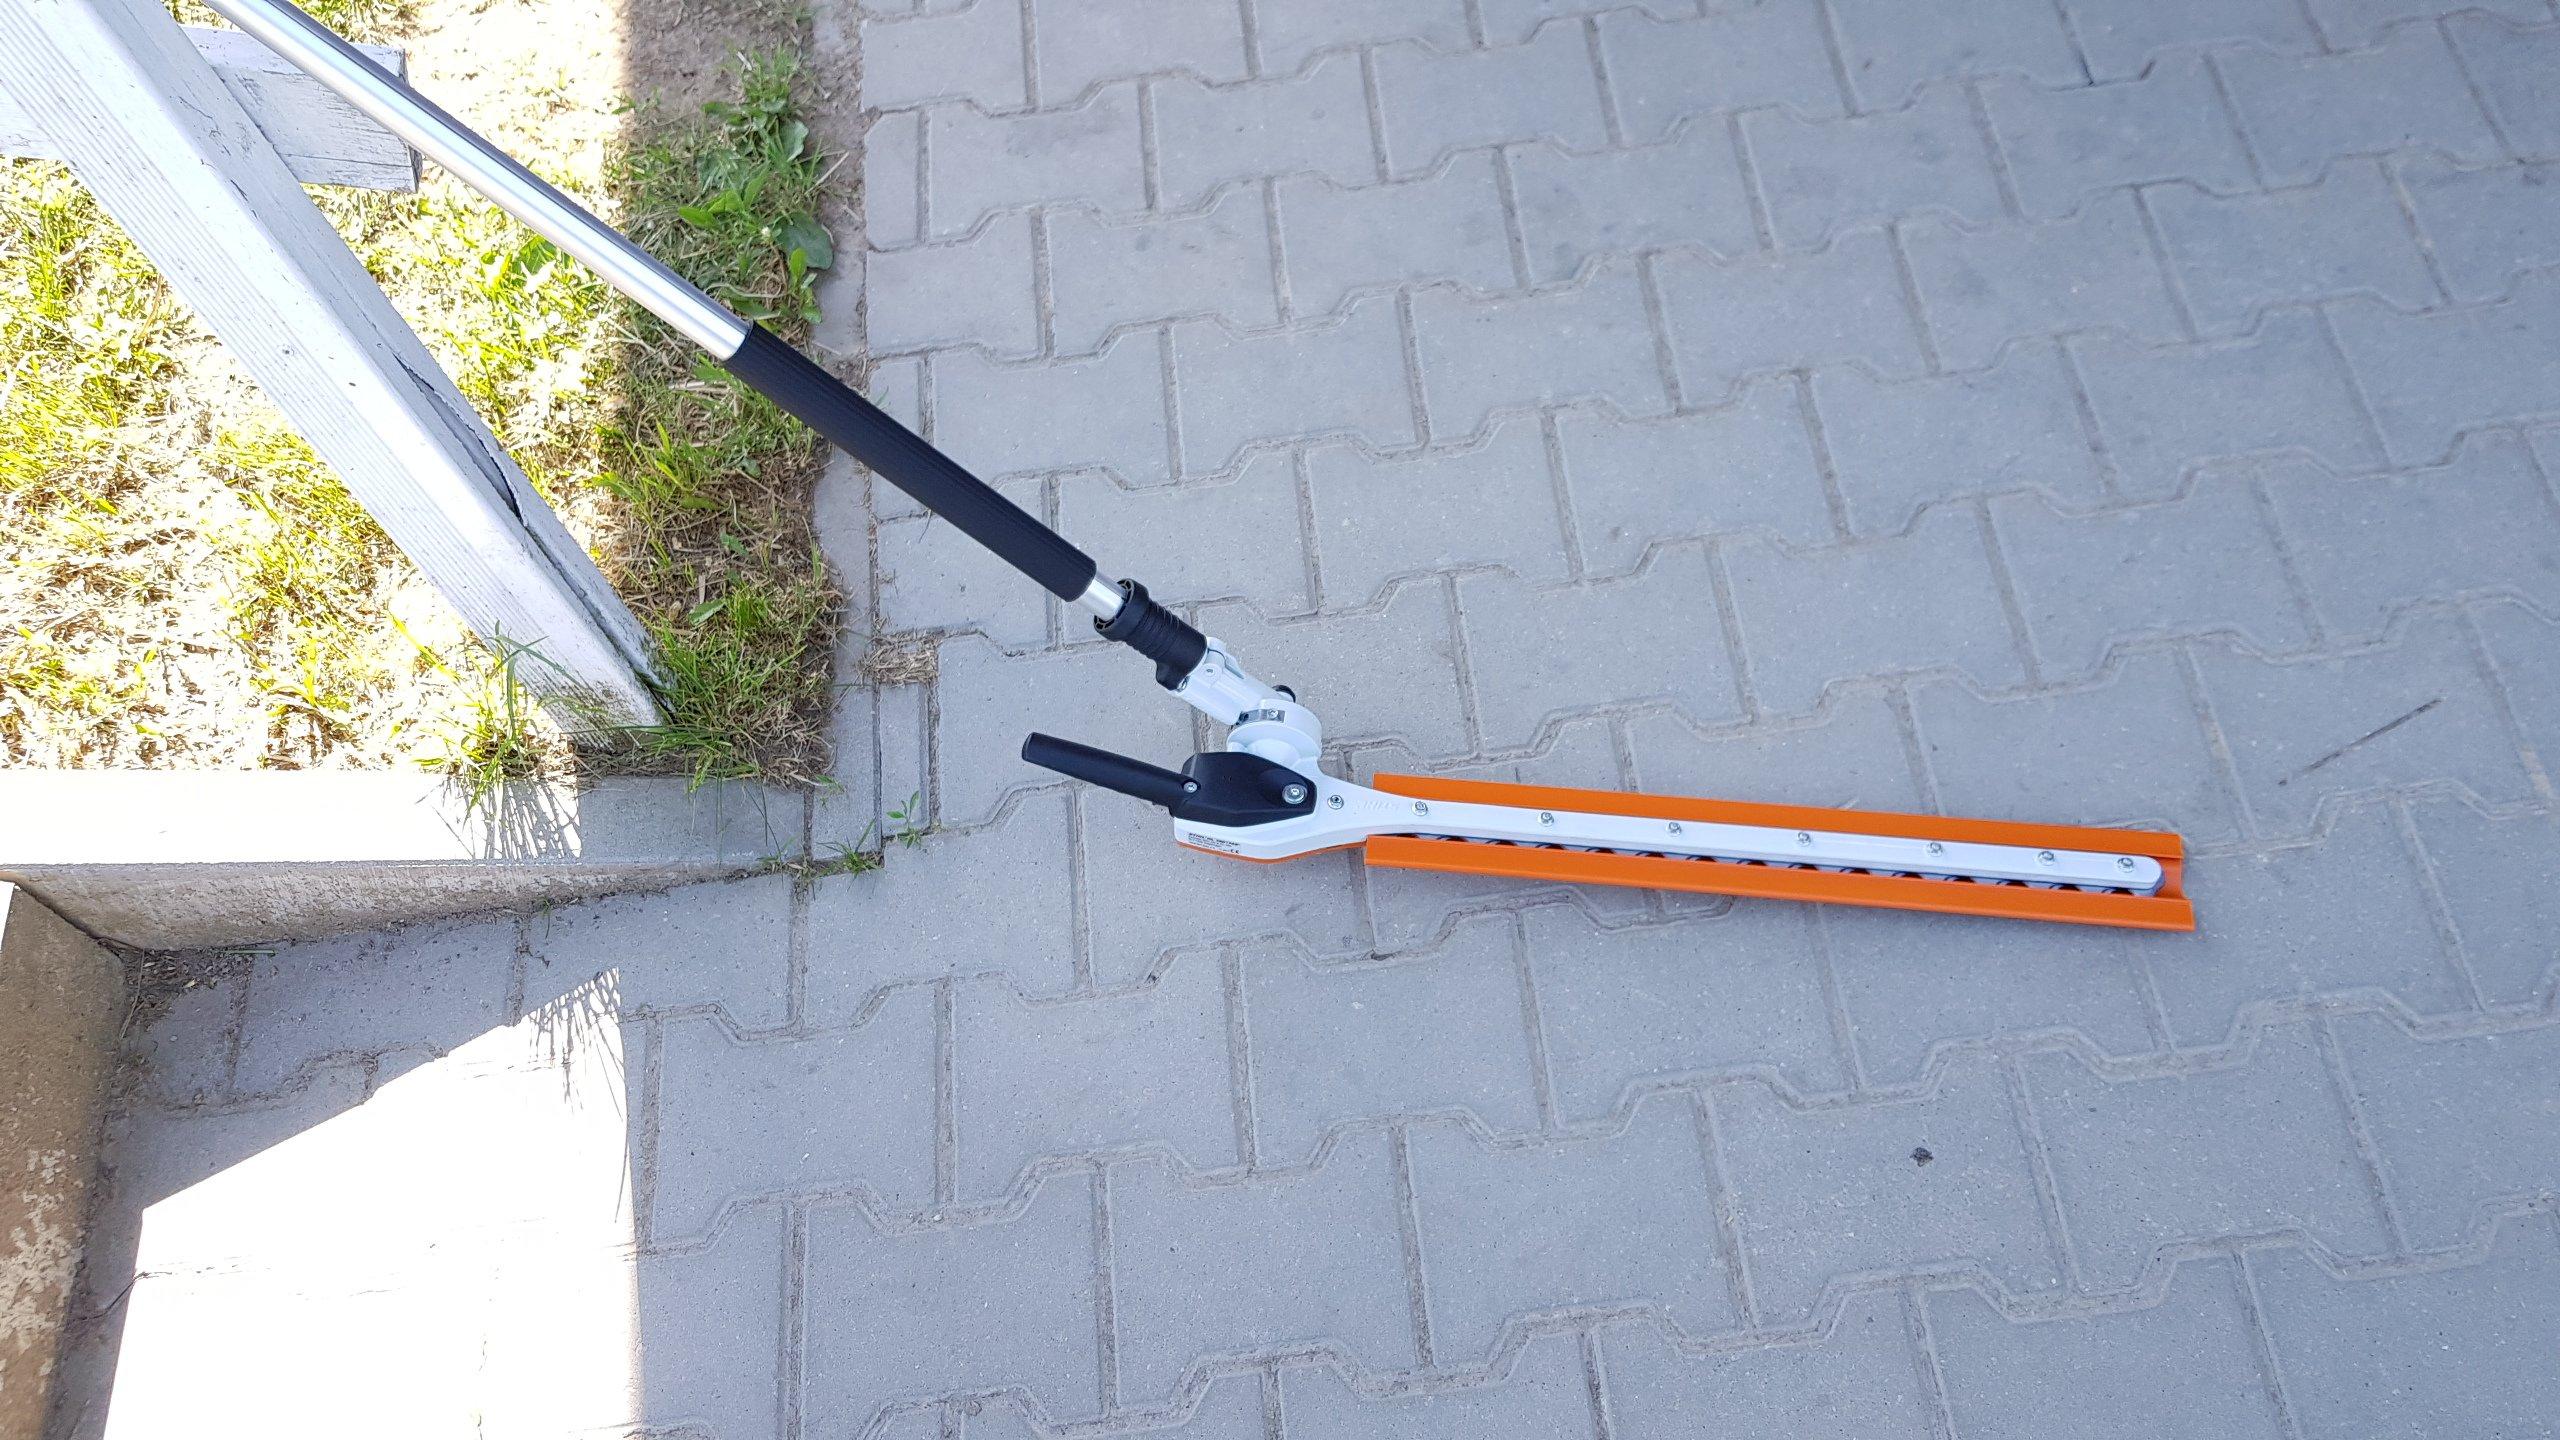 Stihl-HL-KM-145-Grad-Anbauwerkzeug-Heckenschneider-Kombiwerkzeug-Stihl-KM